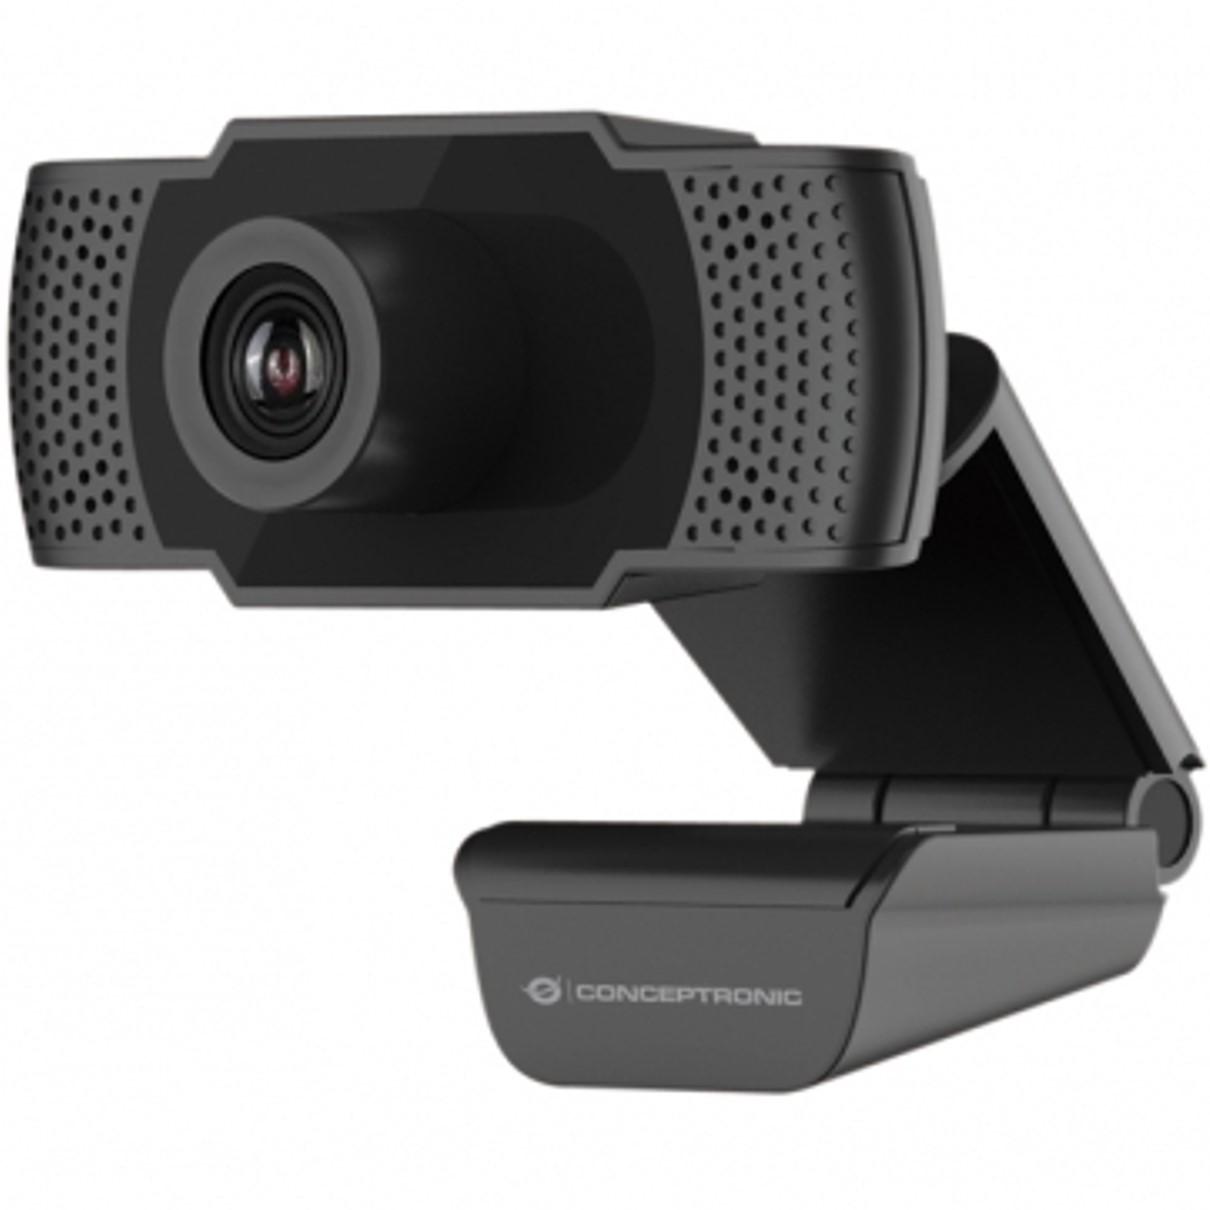 Webcam fhd conceptronic amdis01b - 1080p - usb 2.0 - 30 fps - angulo vision 90º - microfono integrado